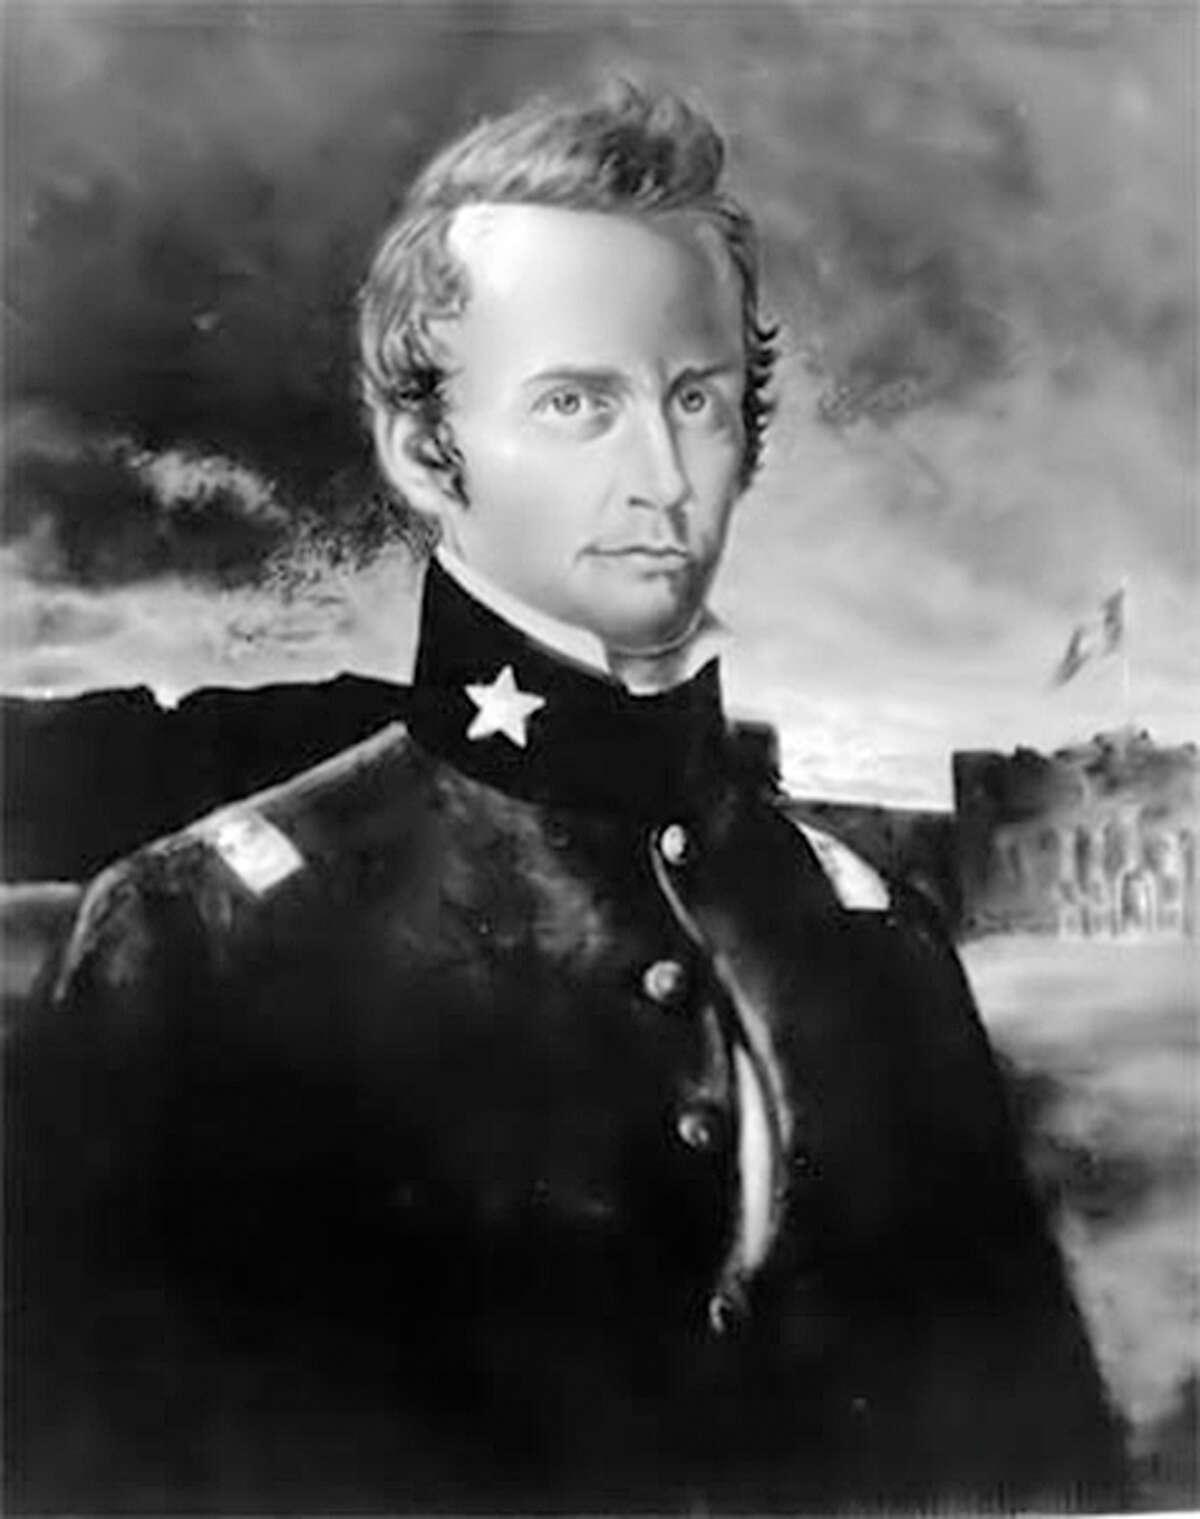 Quarterfinalist:William B. Travis - commander at the Battle of the AlamoDefeated: Audie Murphy, Texas-born World War II heroLawrence Sullivan